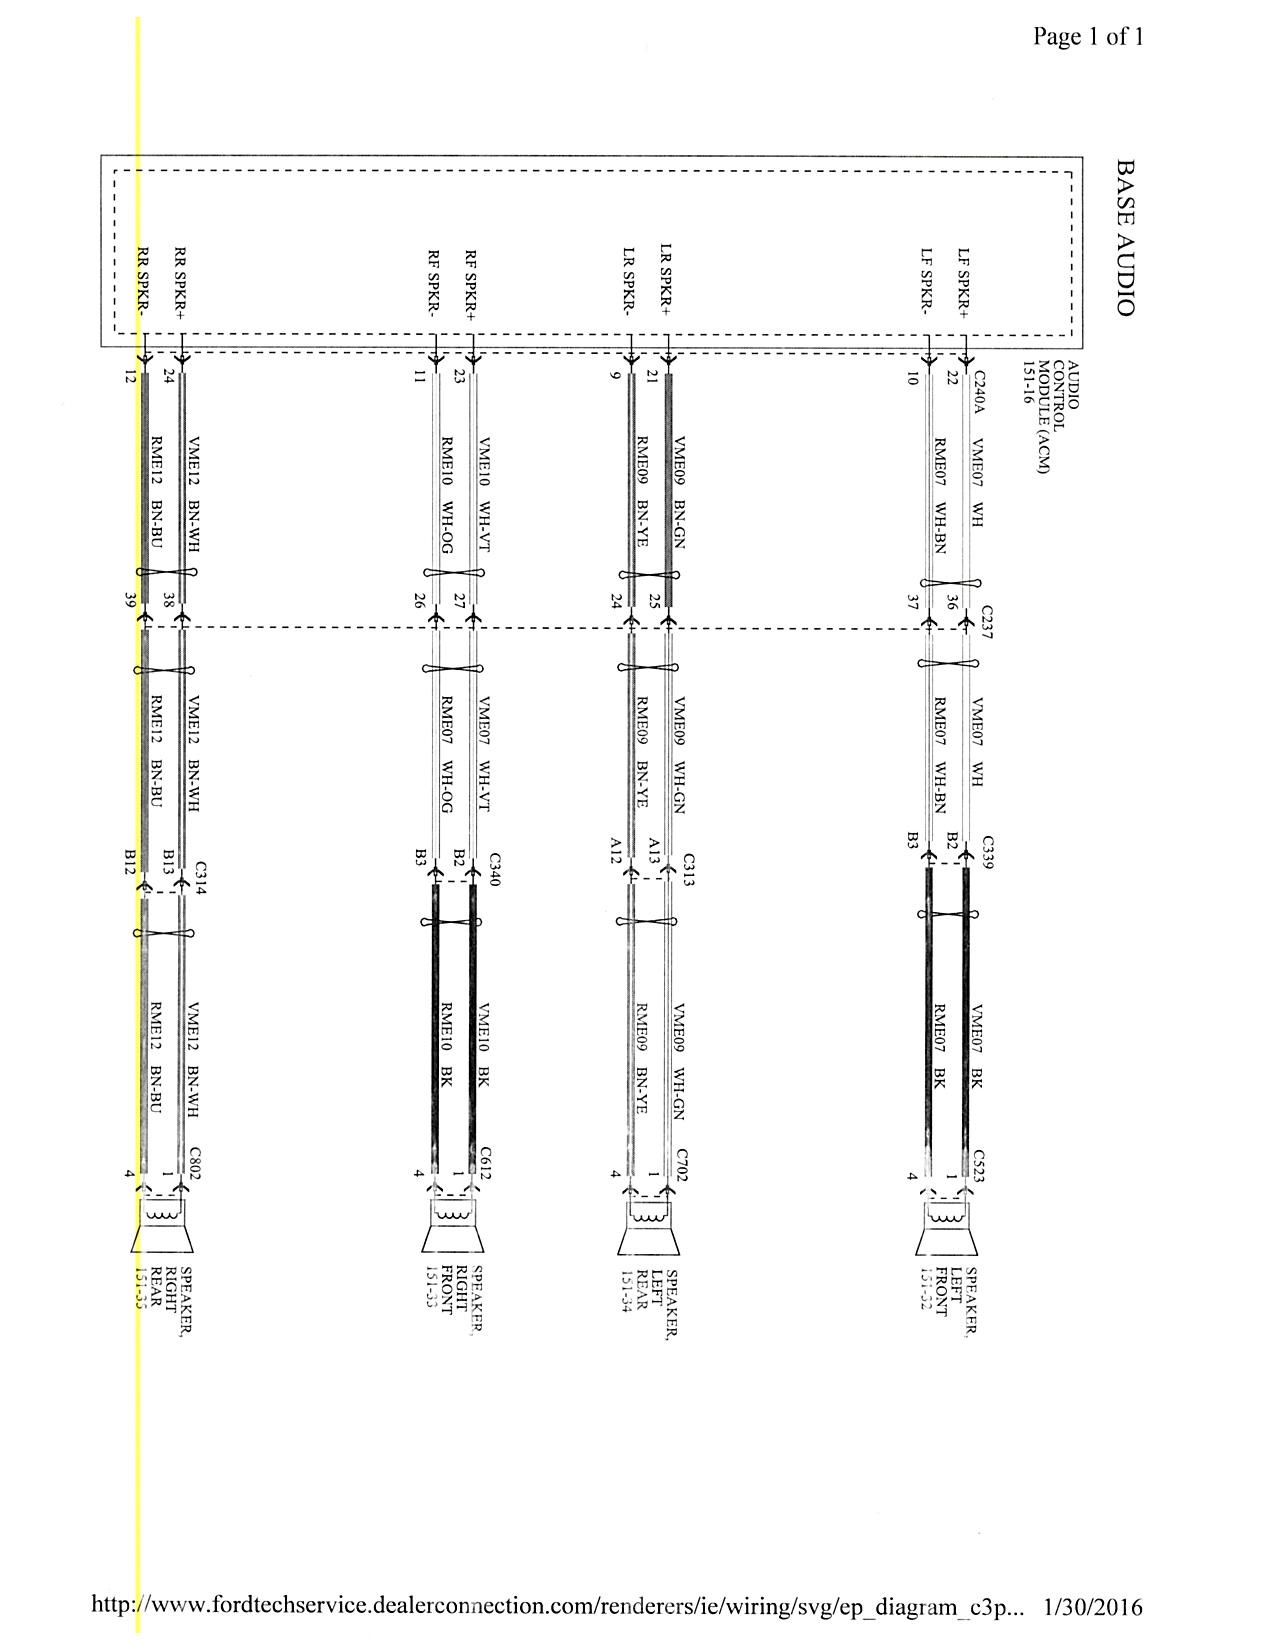 169122d1459385329t 2015 focus mk3 5 stereo wiring diagram wiringdiagrambase ford focus forum, ford focus st forum, ford focus rs forum view 2015 ford radio wiring diagram at soozxer.org